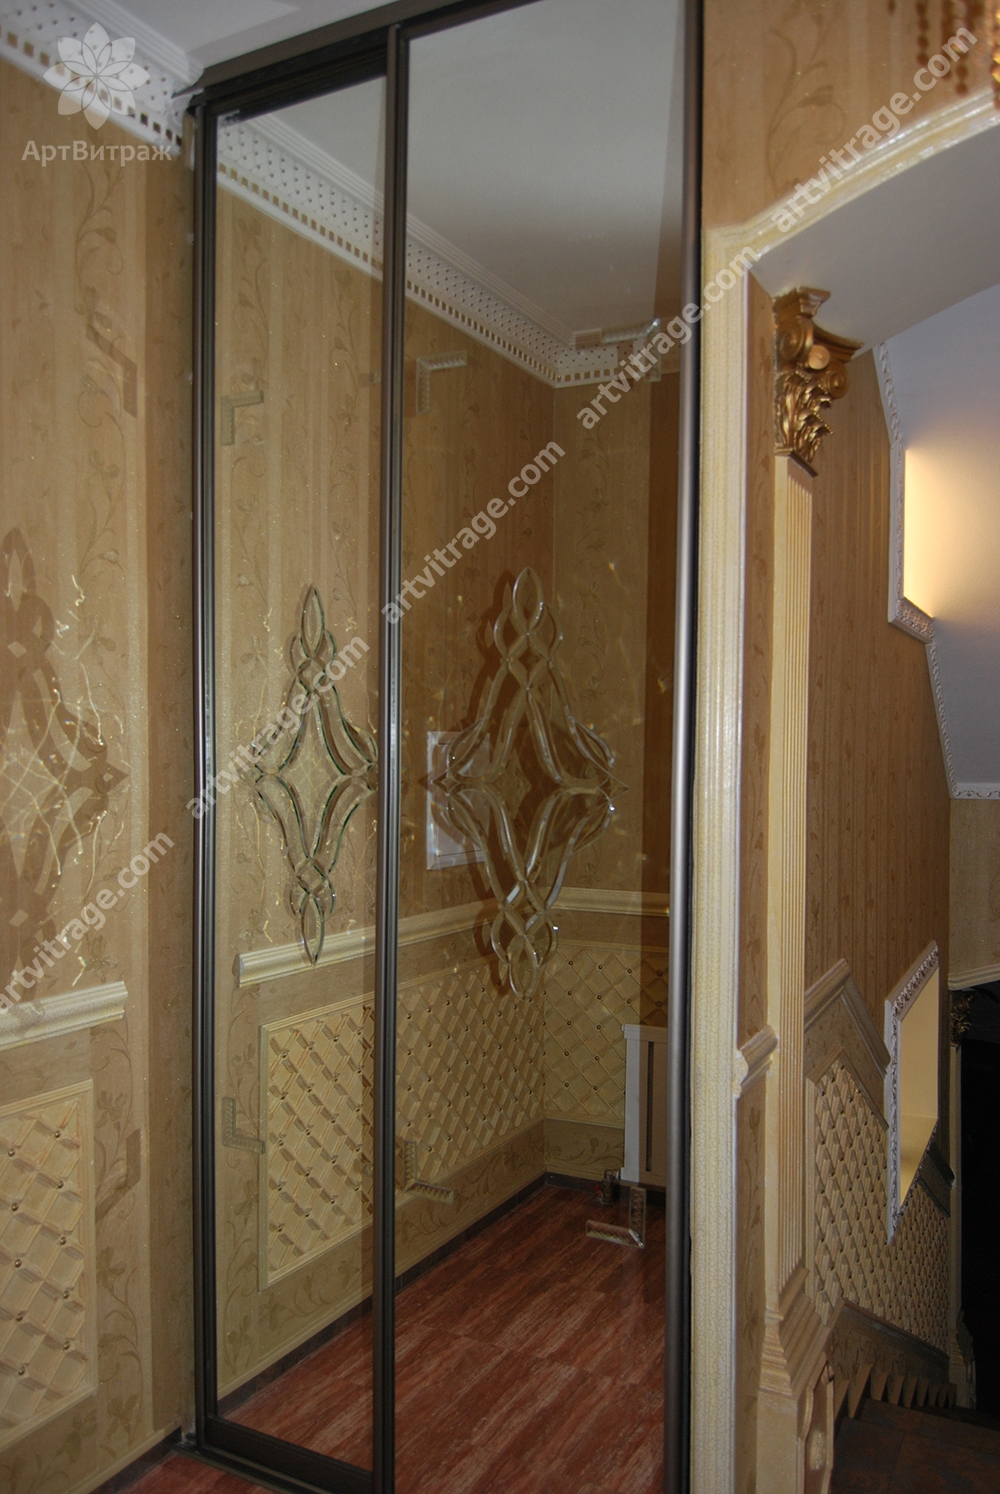 Шкаф с хрустальными элементами